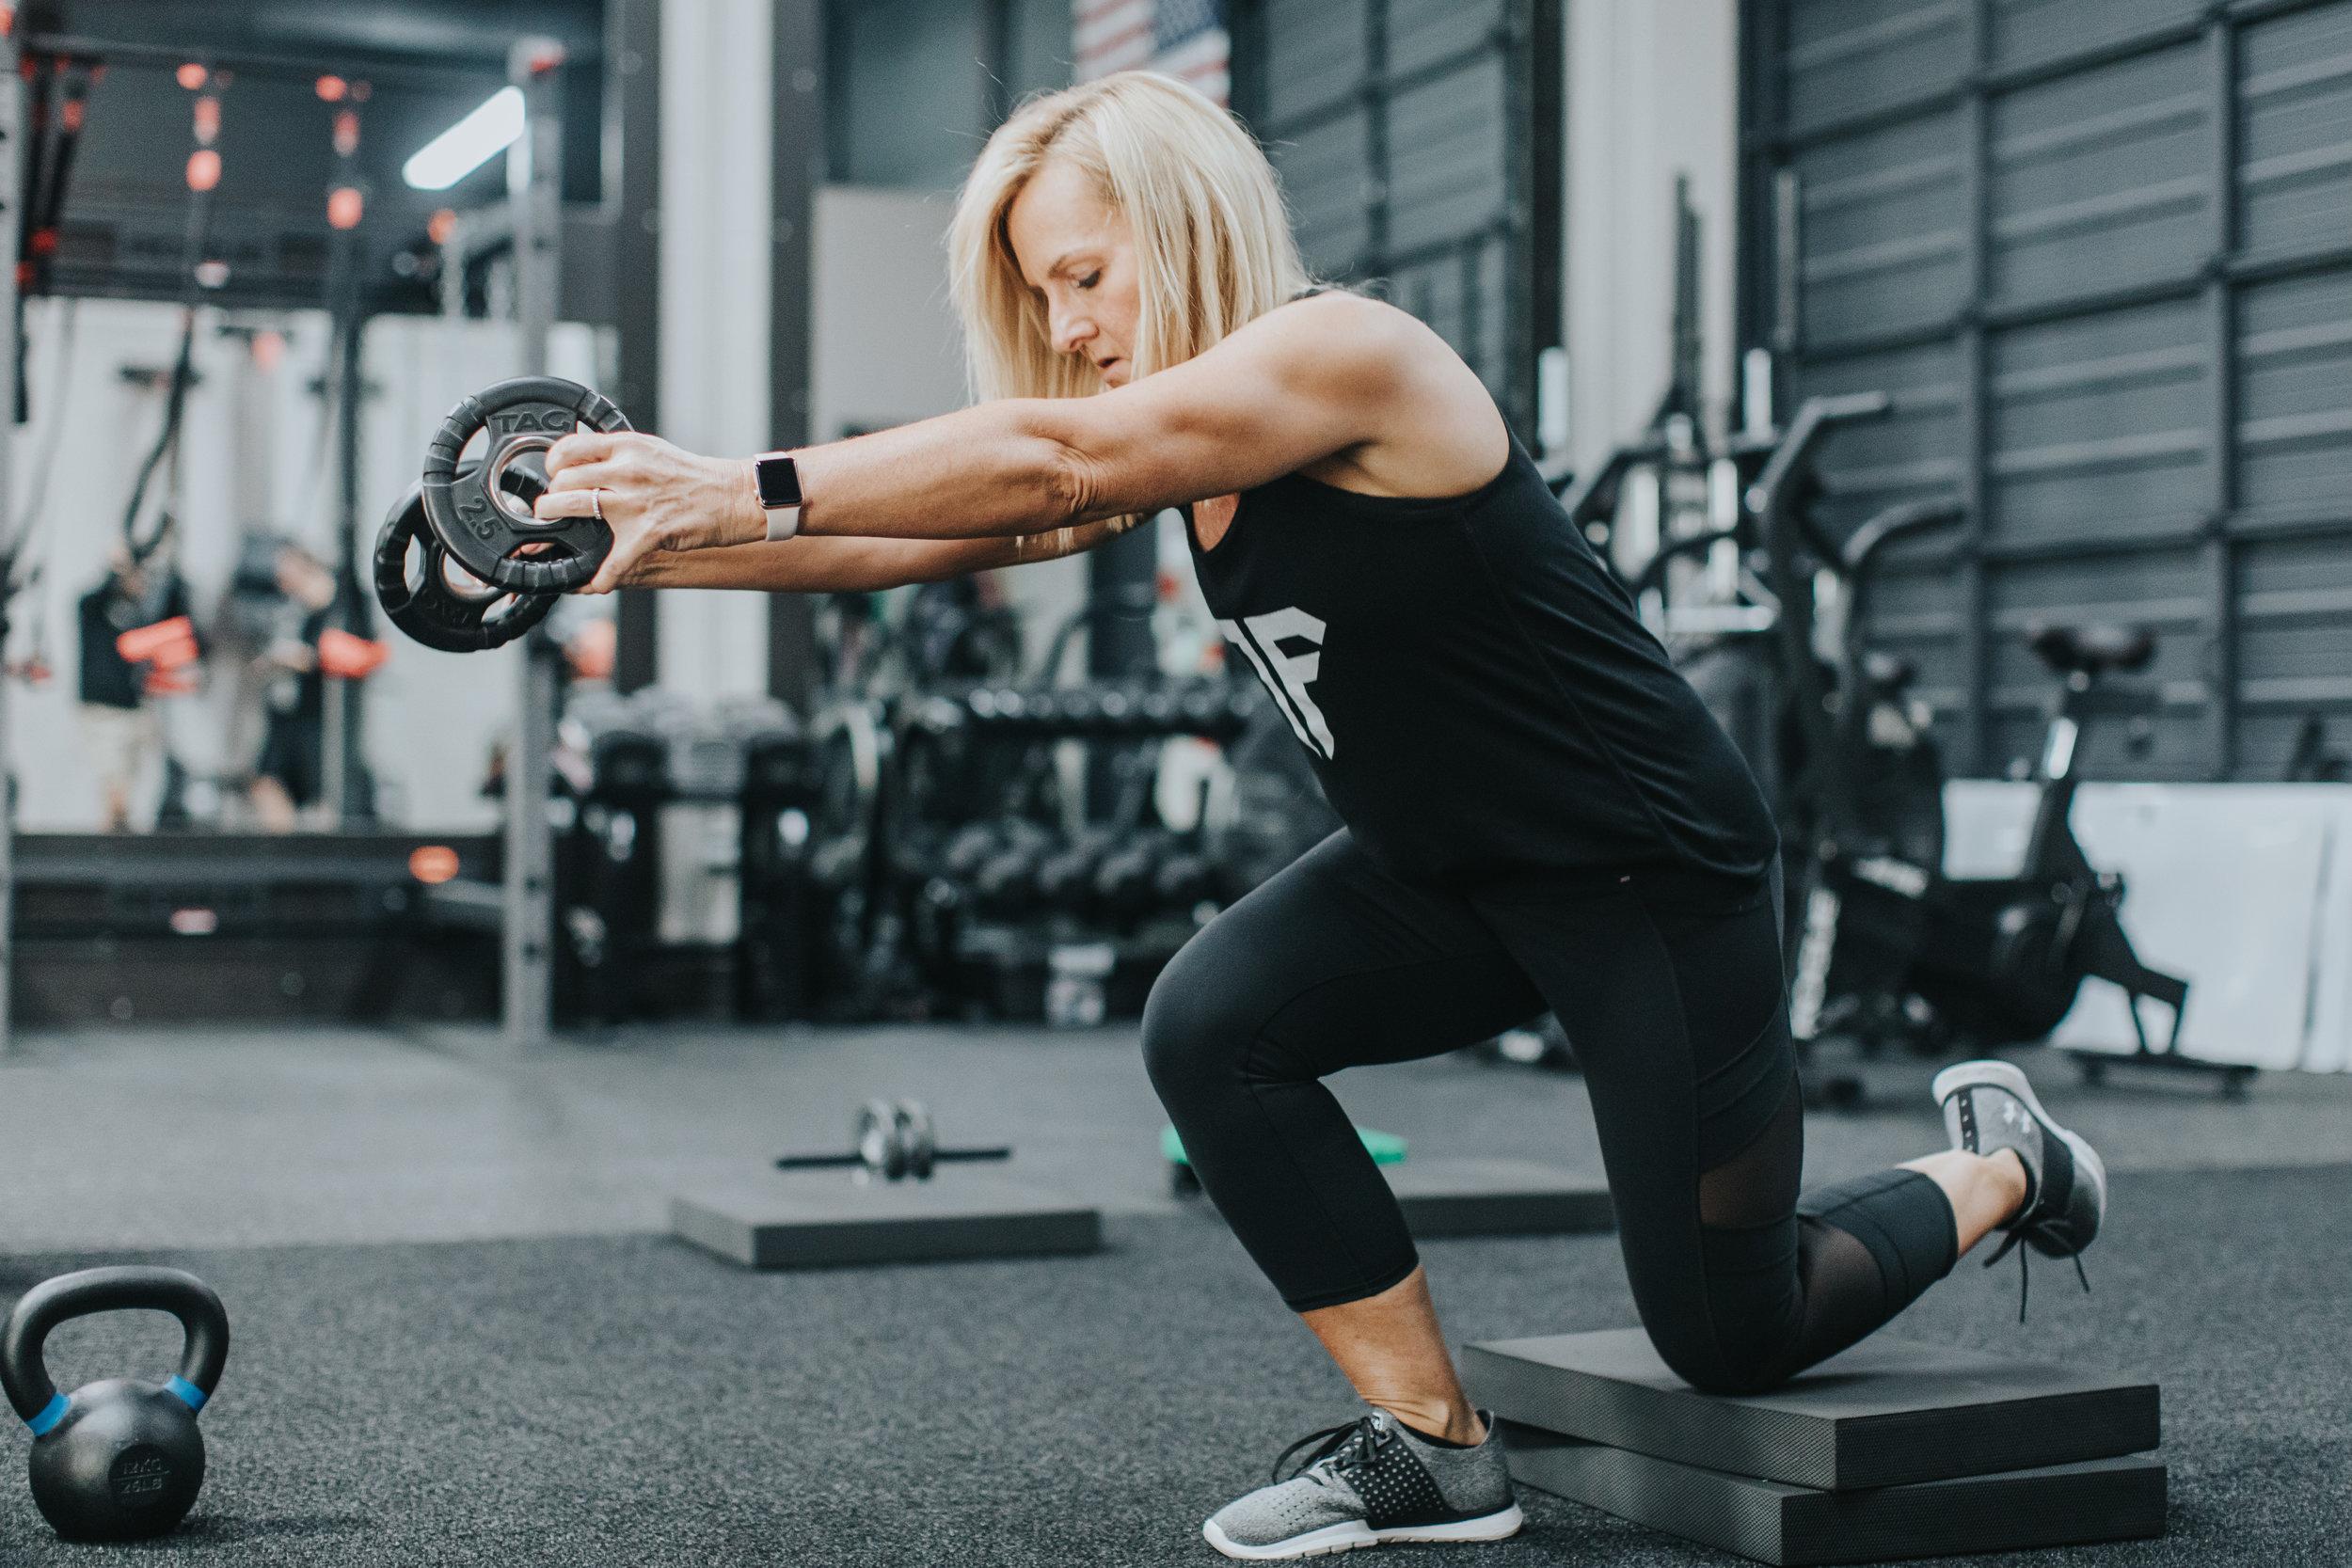 Thrive-Gym-Preview-27.jpg